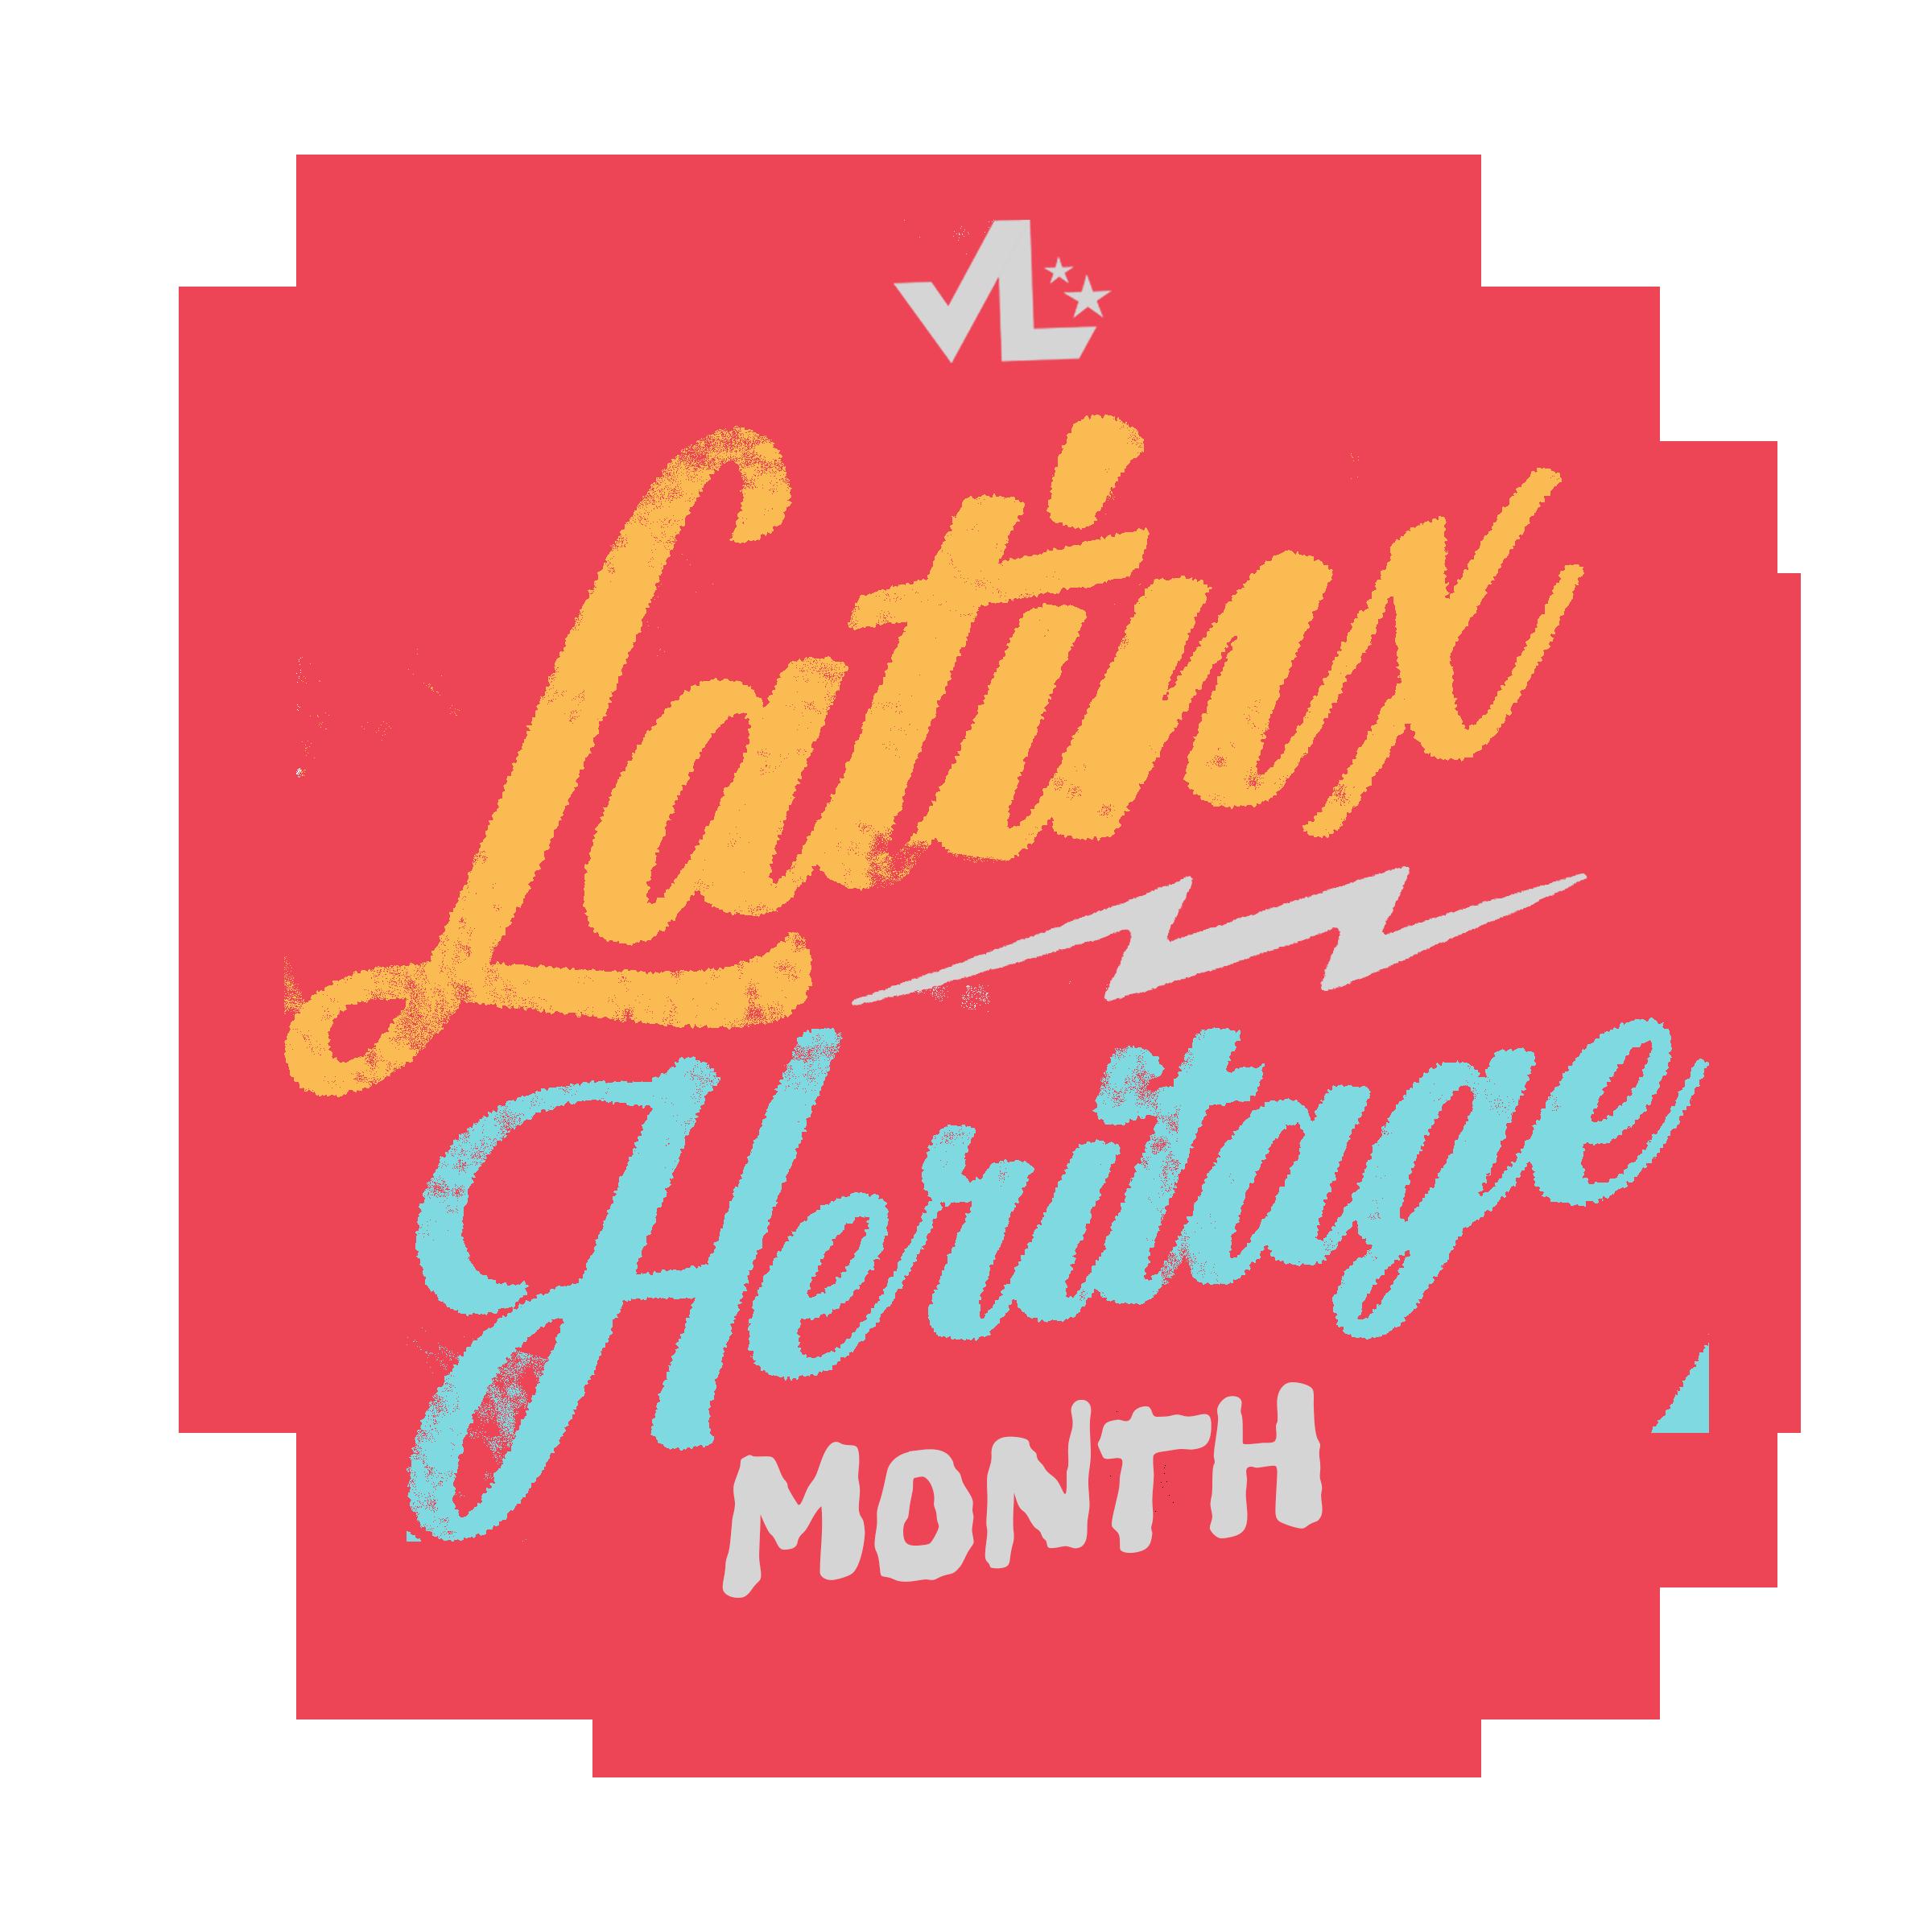 Voto Latino Foundation